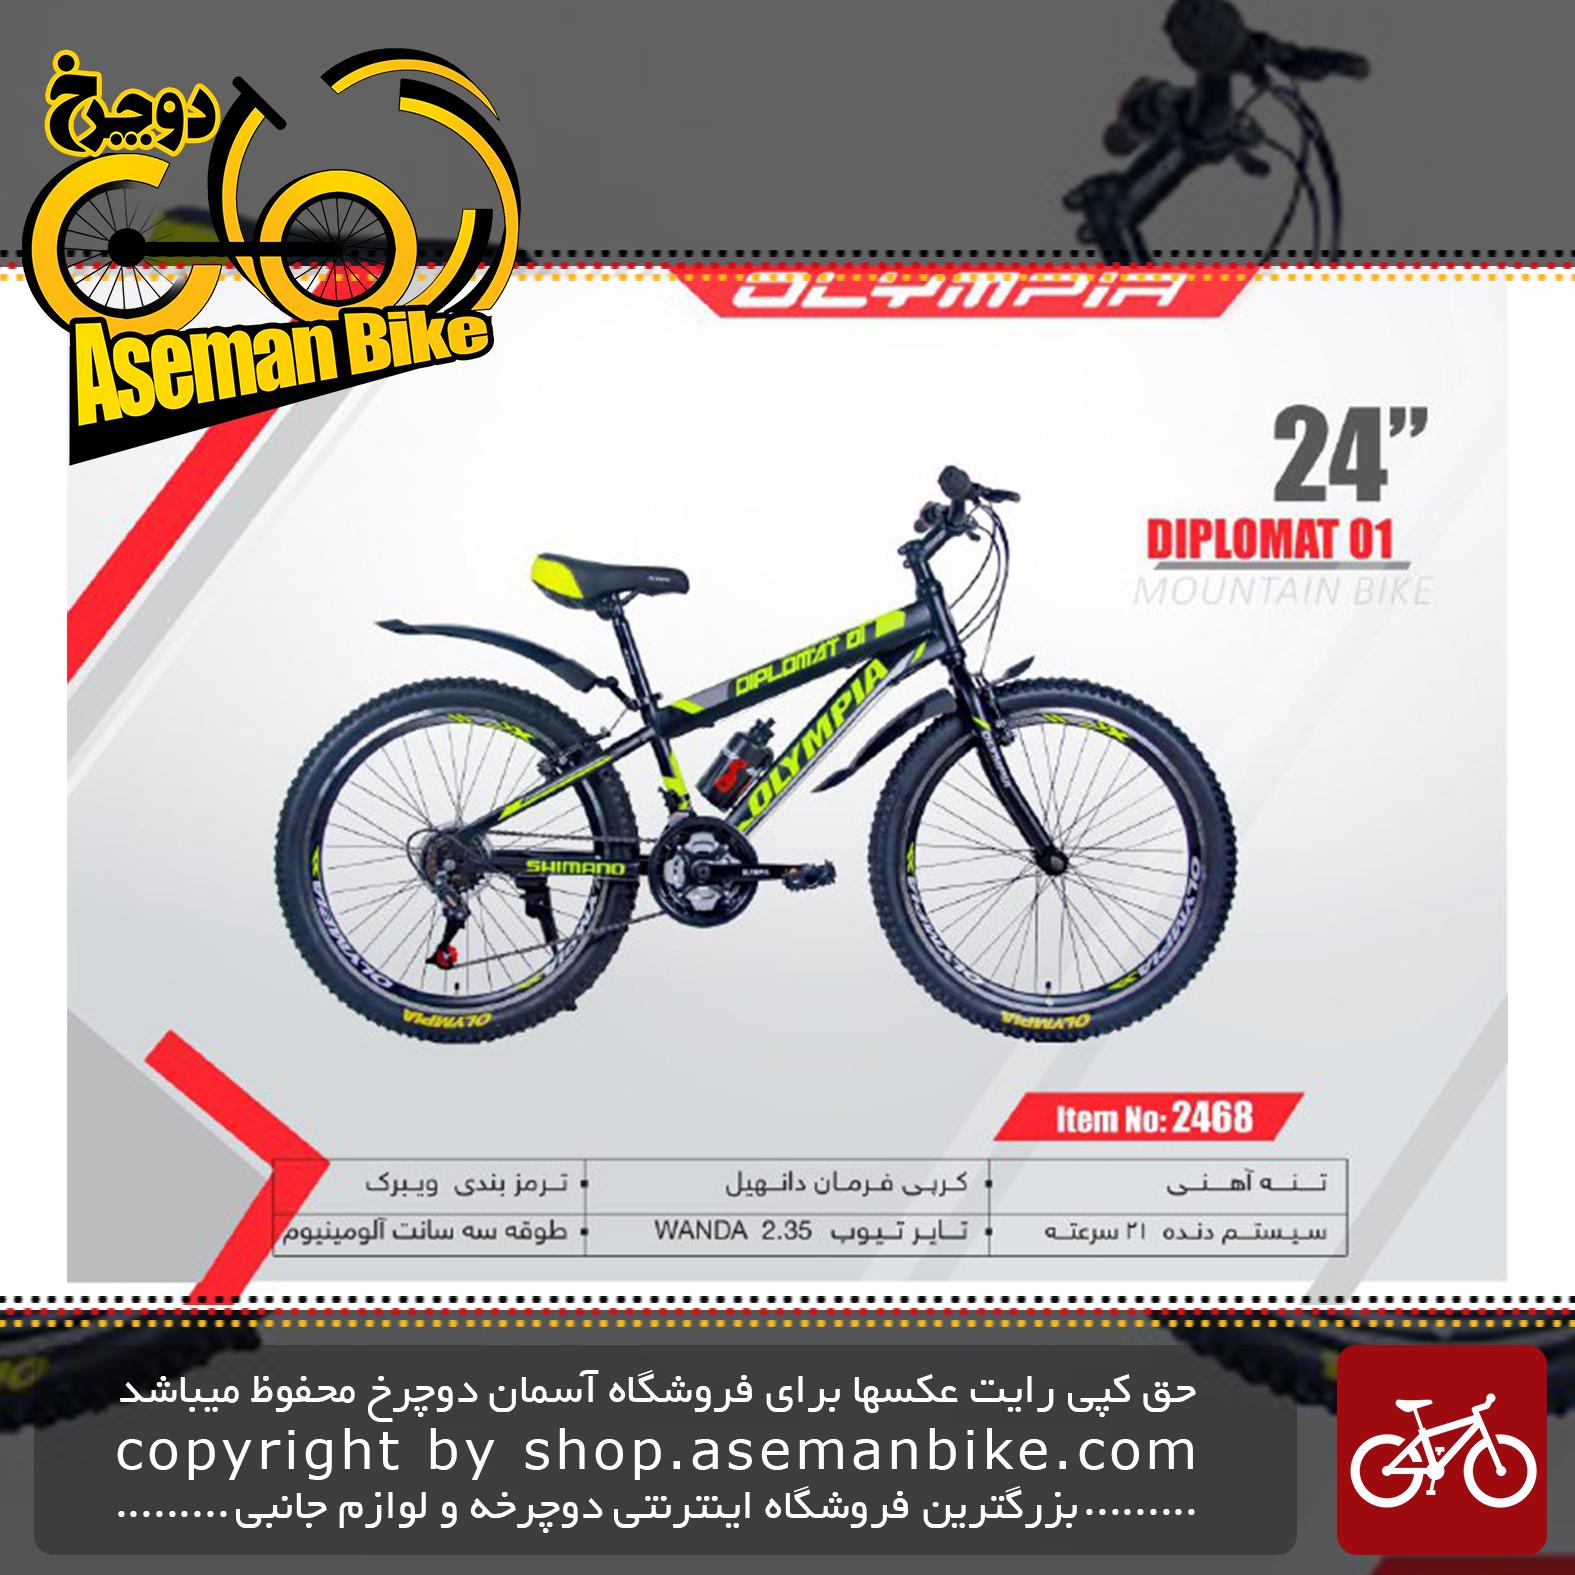 دوچرخه کوهستان المپیا سایز24 مدل دیپلومات OLYMPIA SIZE 24 DIPLOMAT 01 01